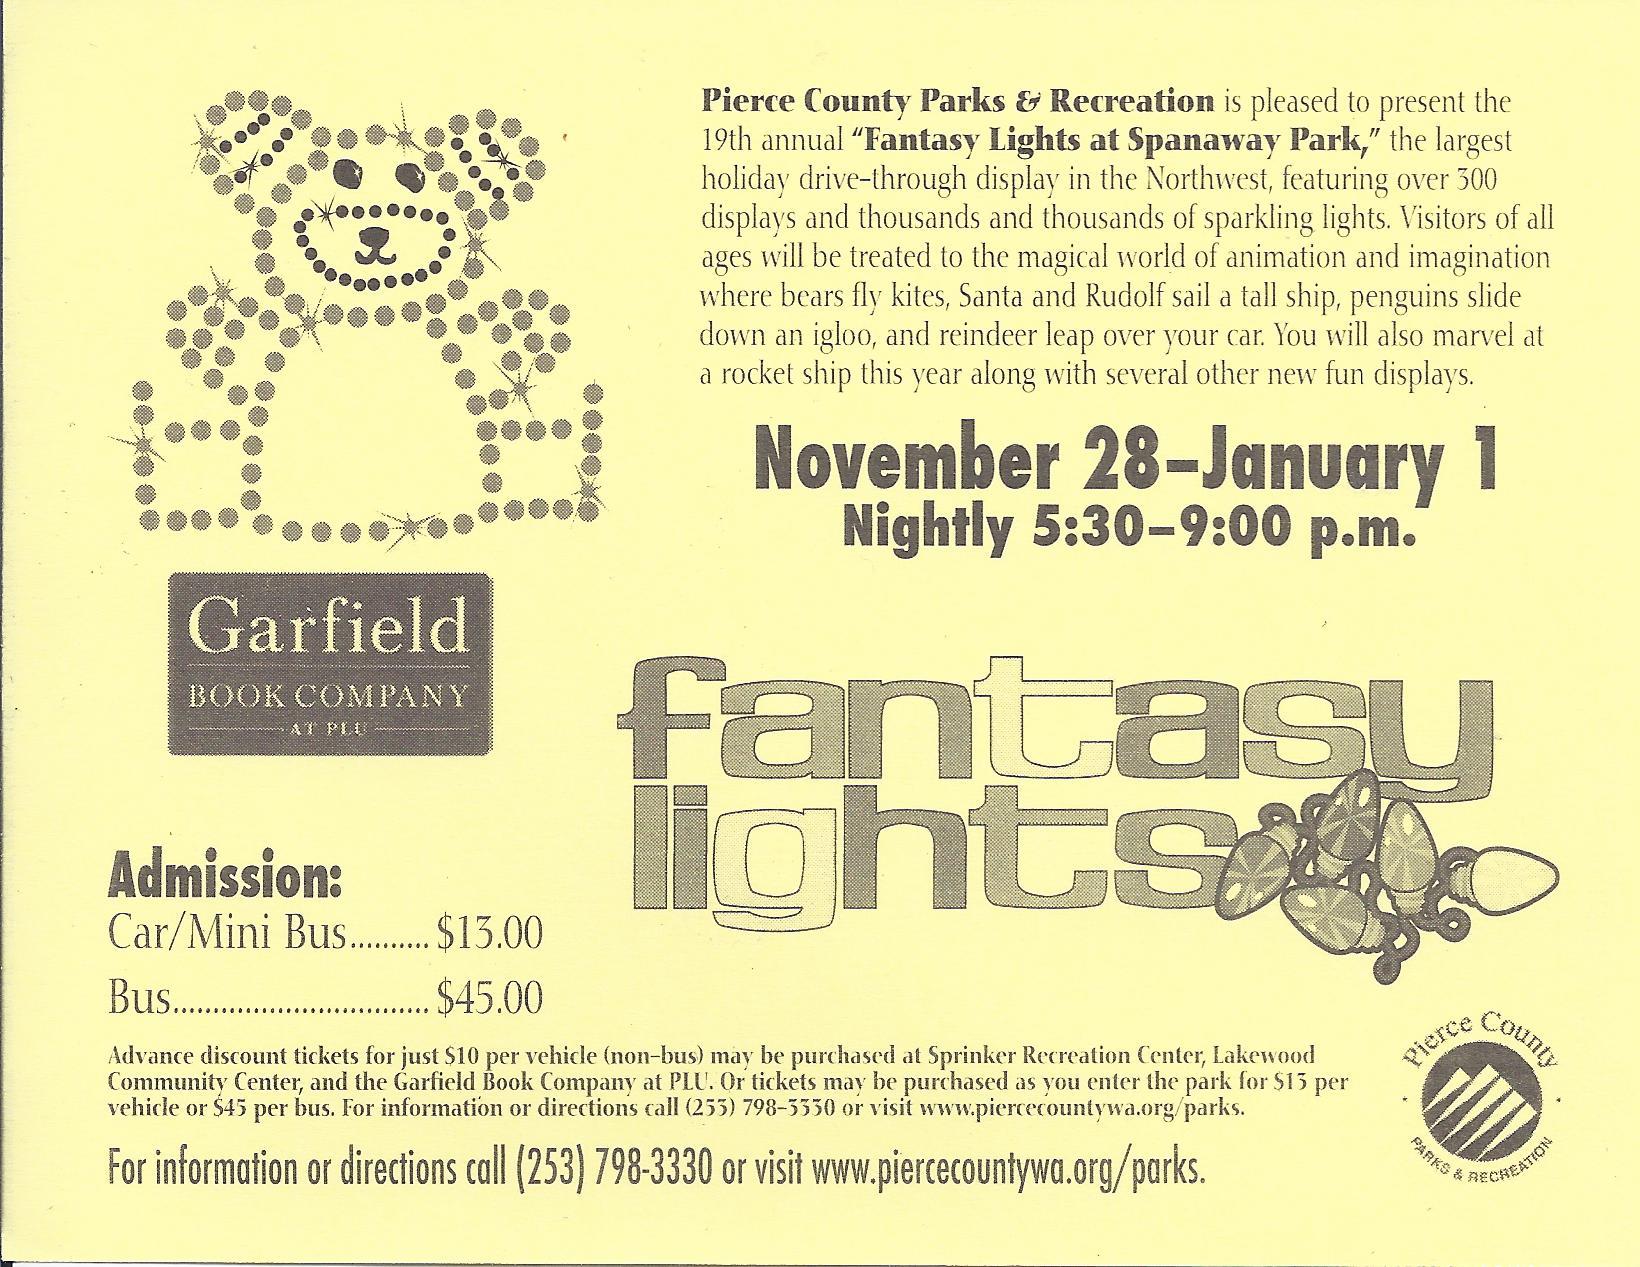 Walk Fantasy Lights on Sunday, Nov. 24 – Pierce Prairie Post